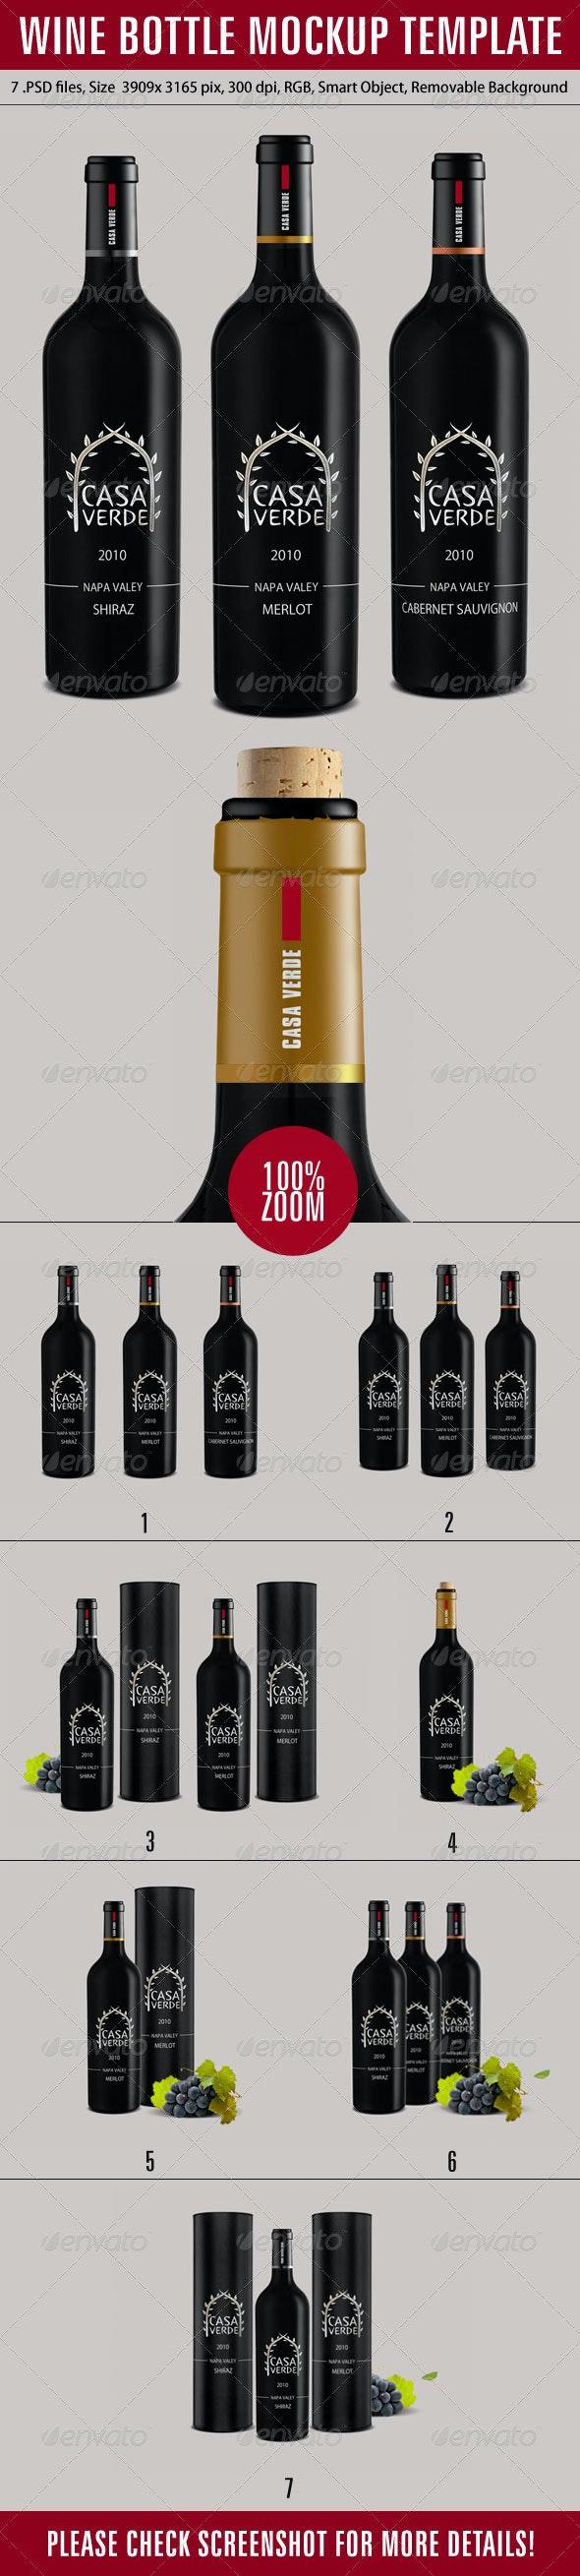 Wine Bottle Mockup Template - Product Mock-Ups Graphics